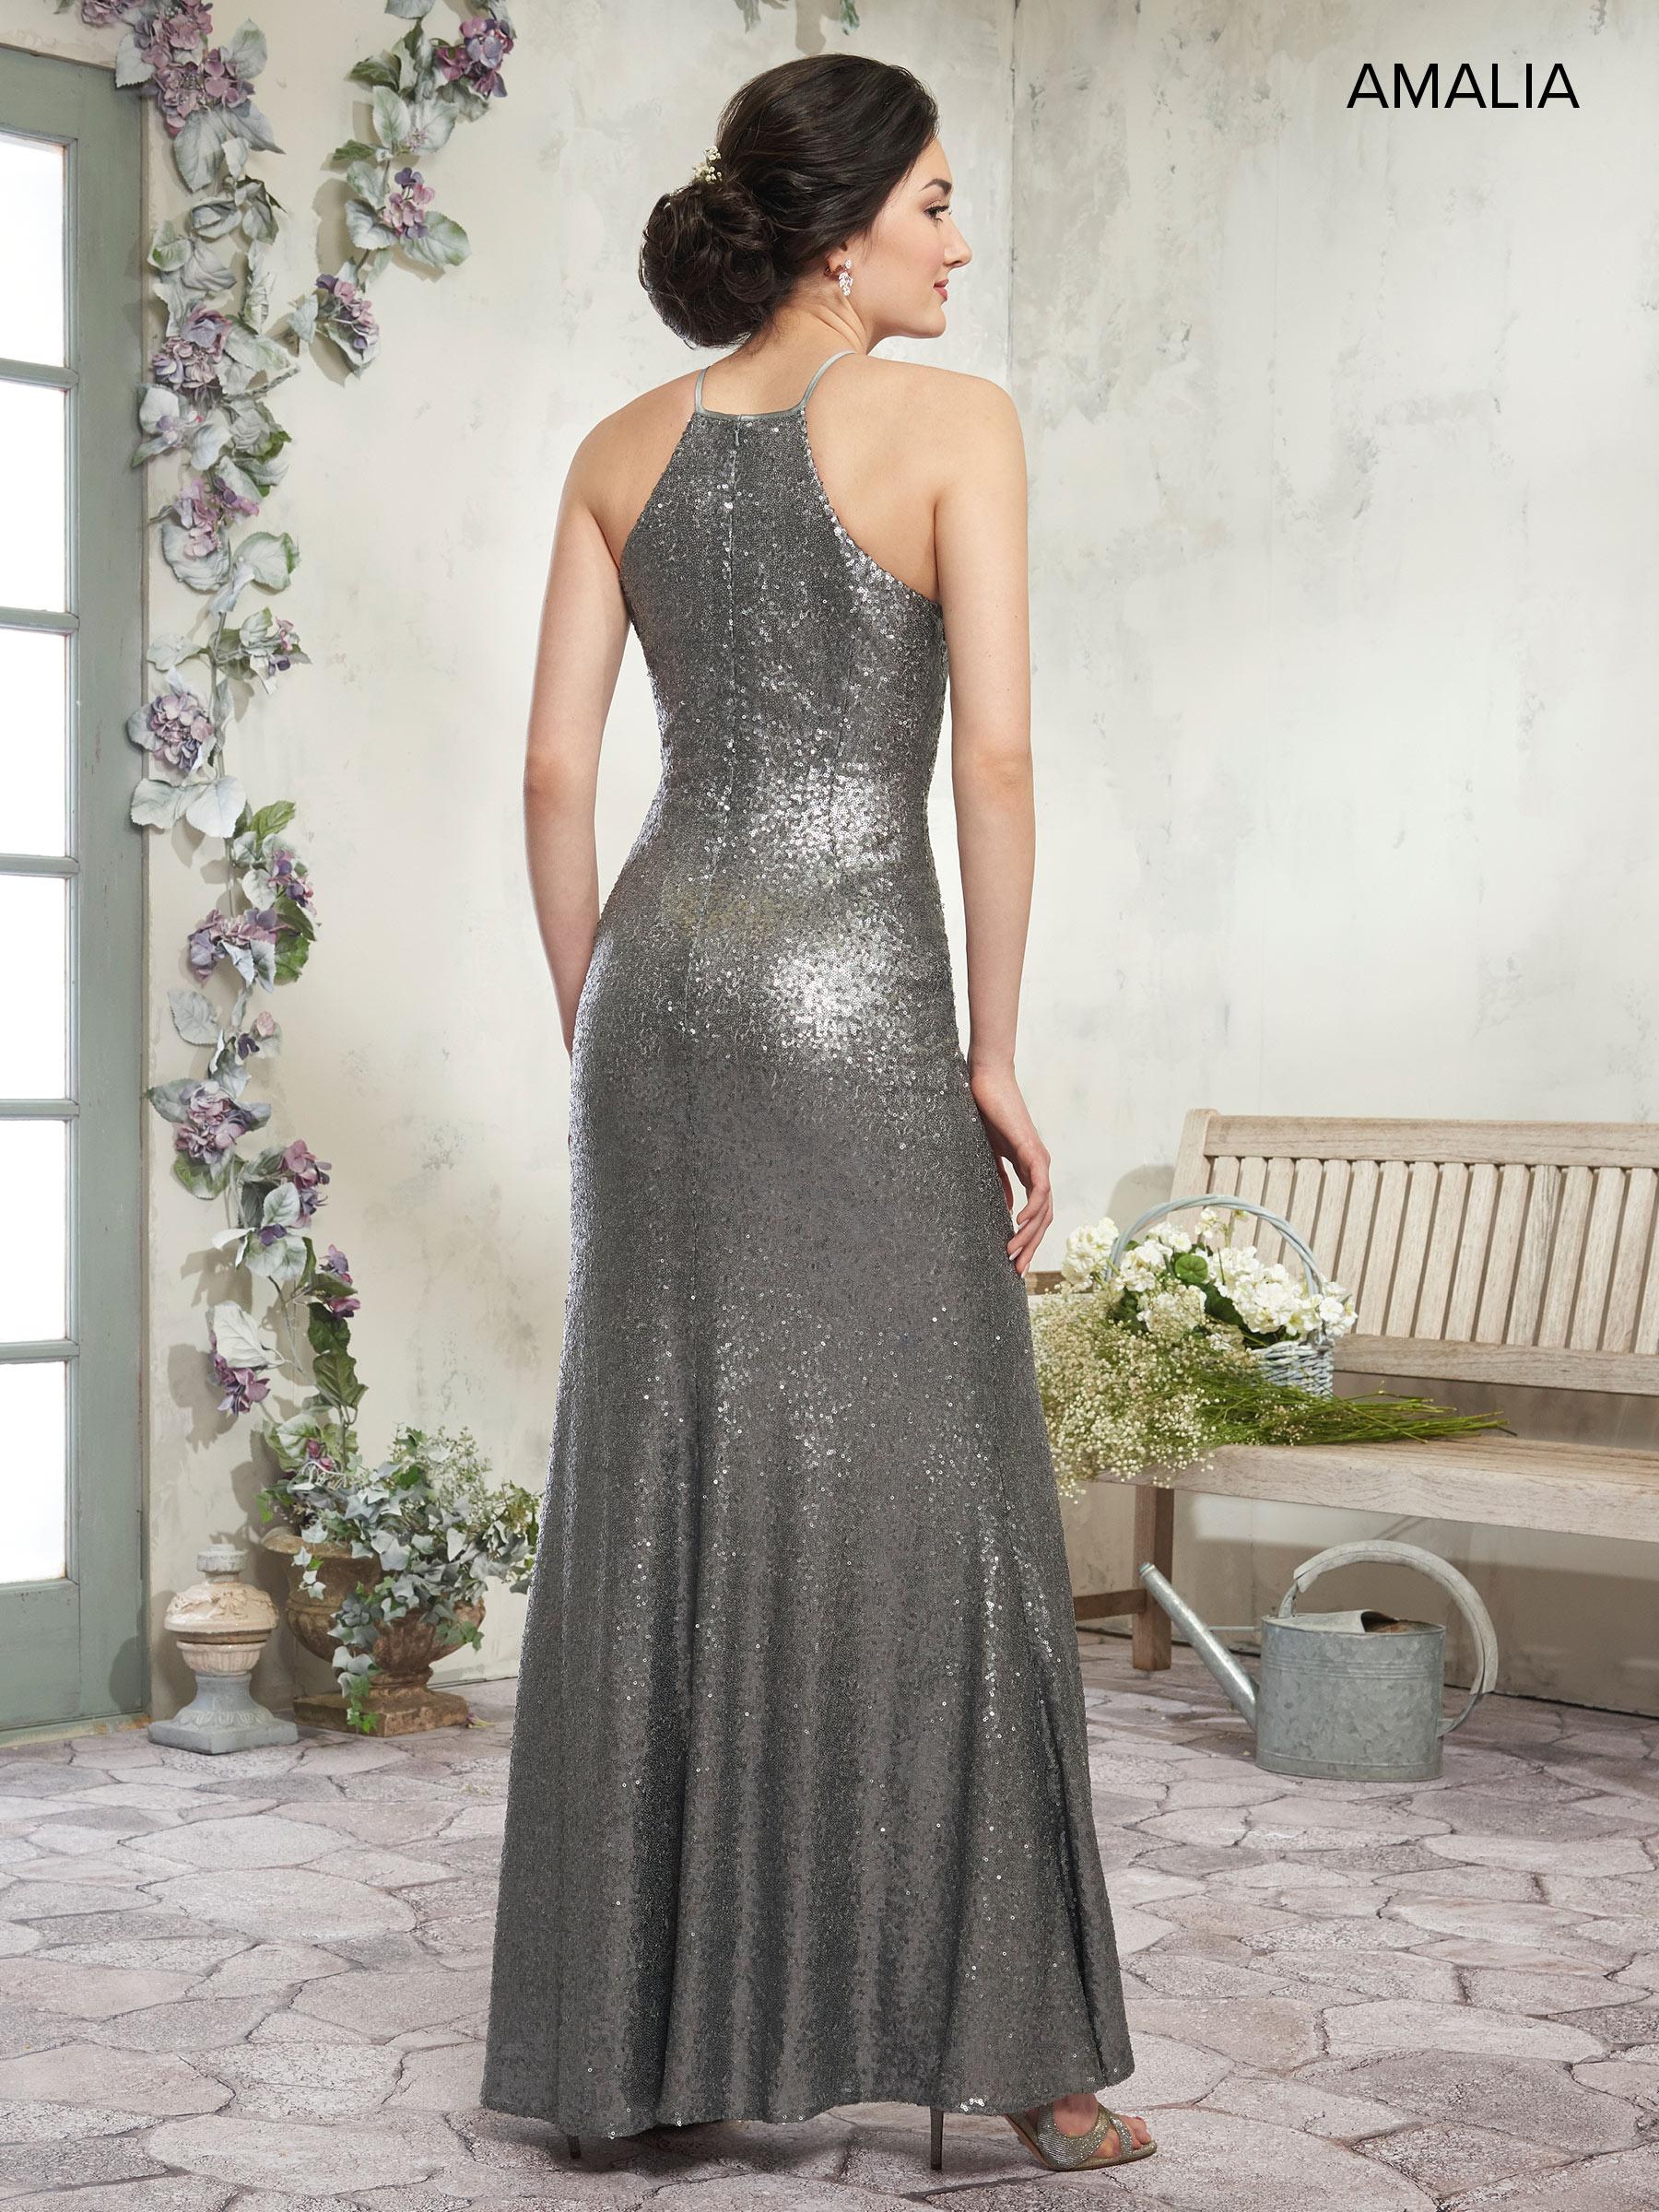 Amalia Bridesmaid Dresses | Amalia | Style - MB7001